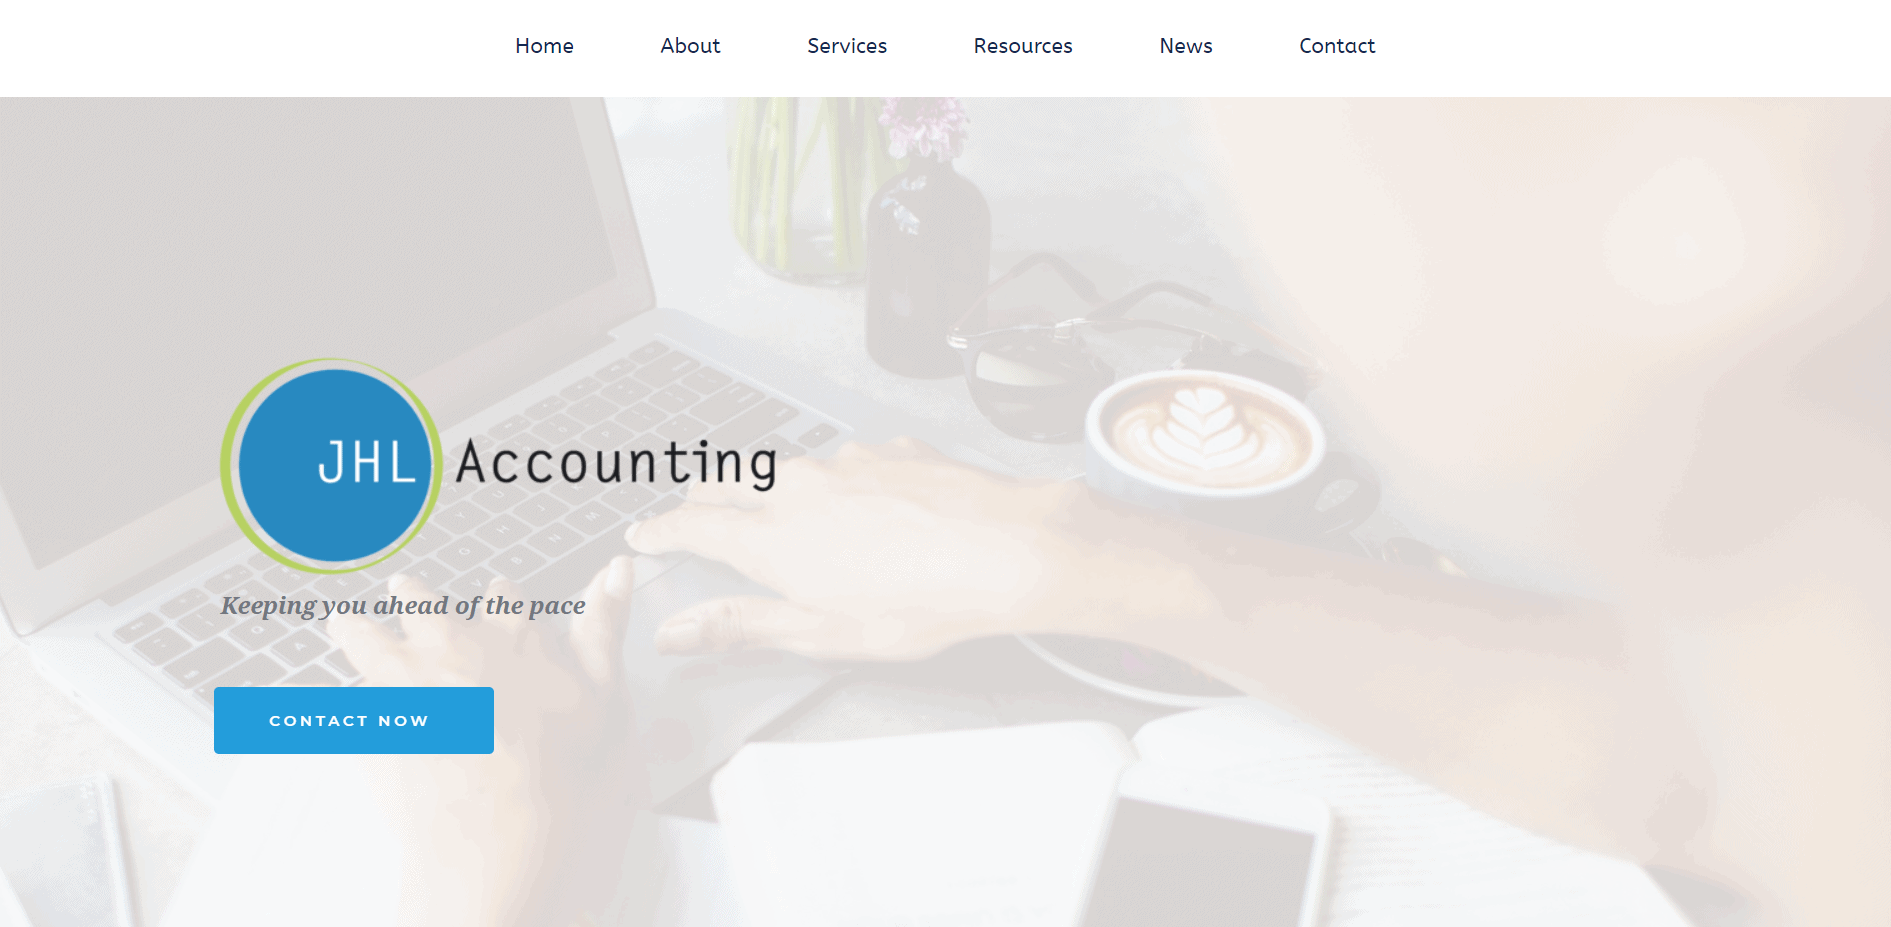 Jhl Accounting